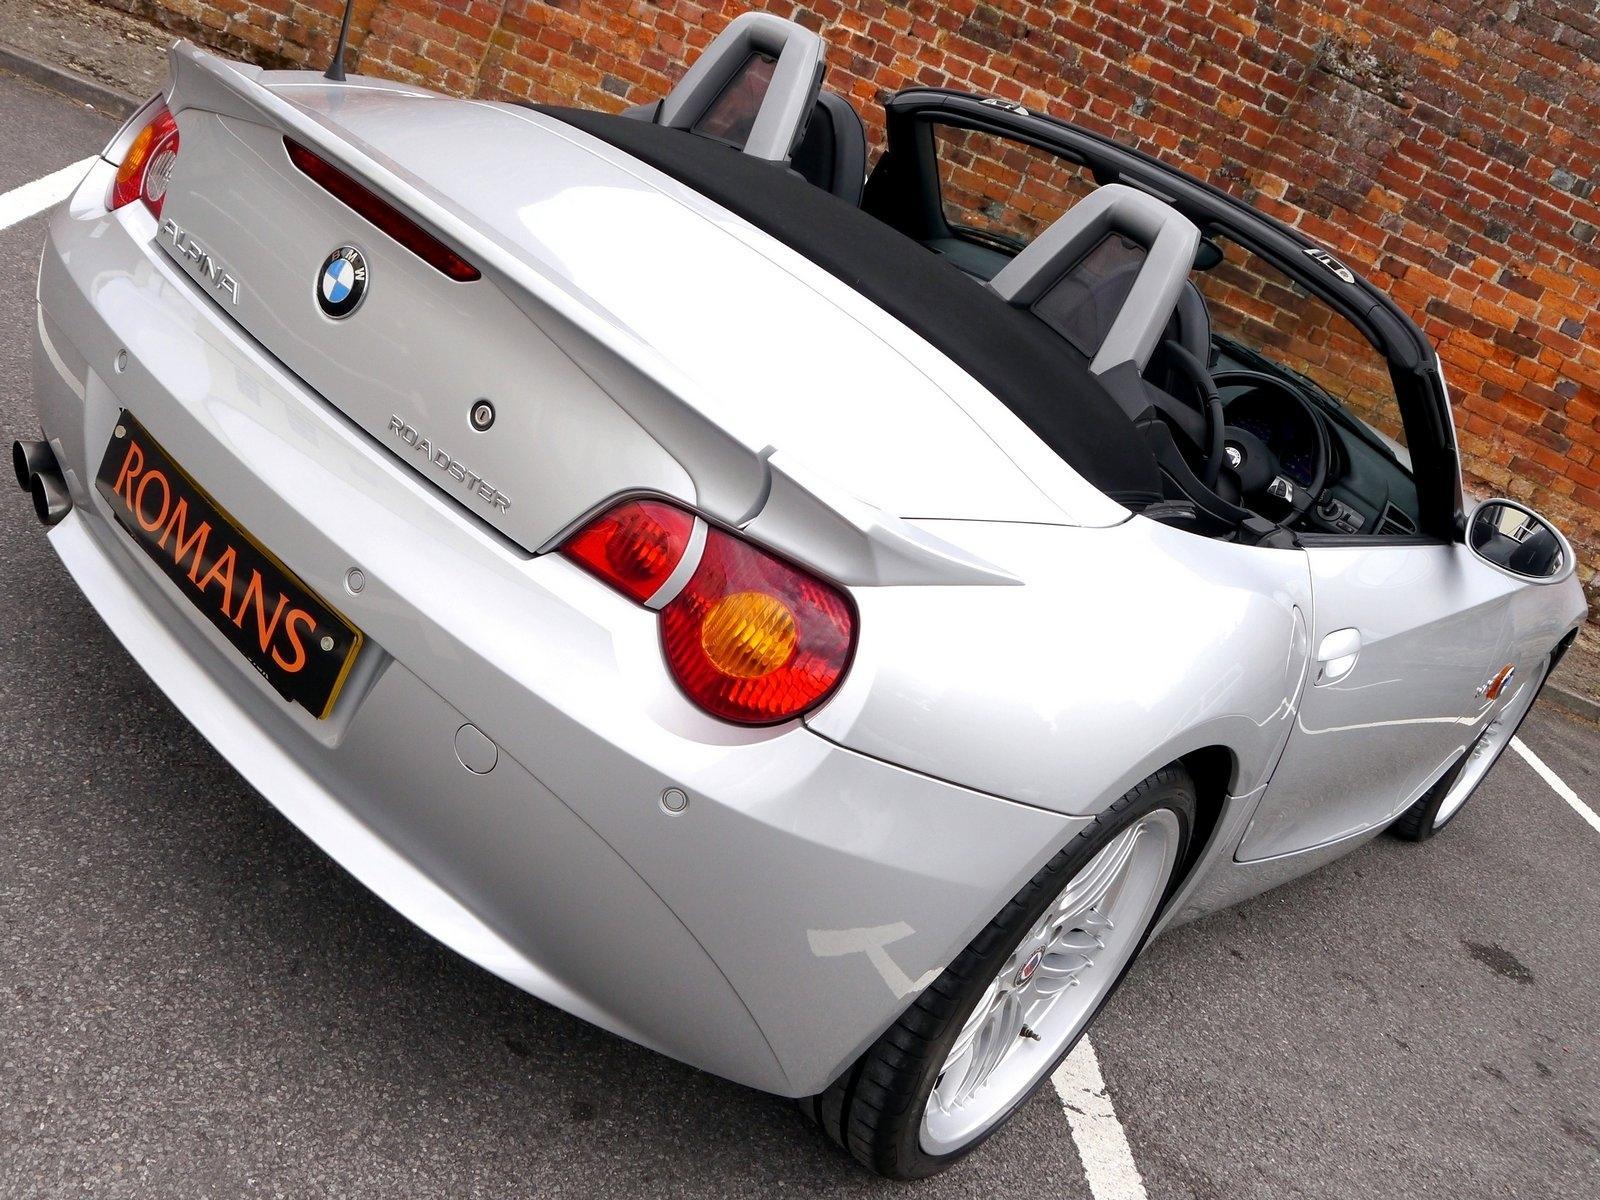 BMWALPINA ROADSTER 3.4 S LUX - RARE VEHICLE - BMW FSH #5